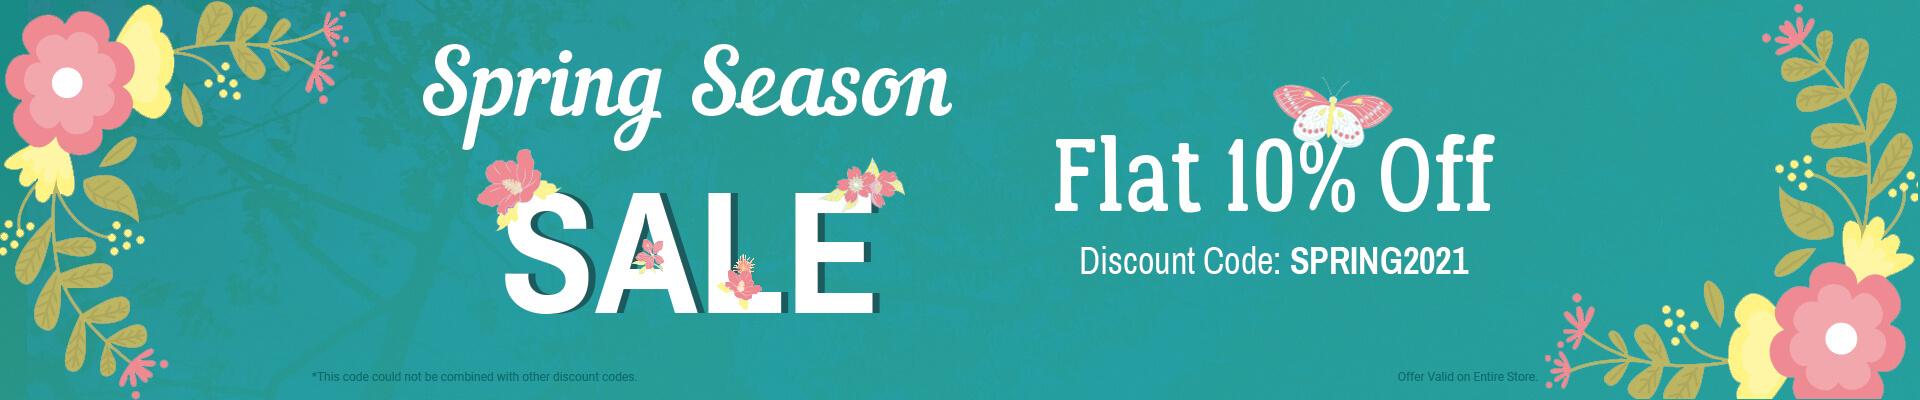 Spring Season Sale